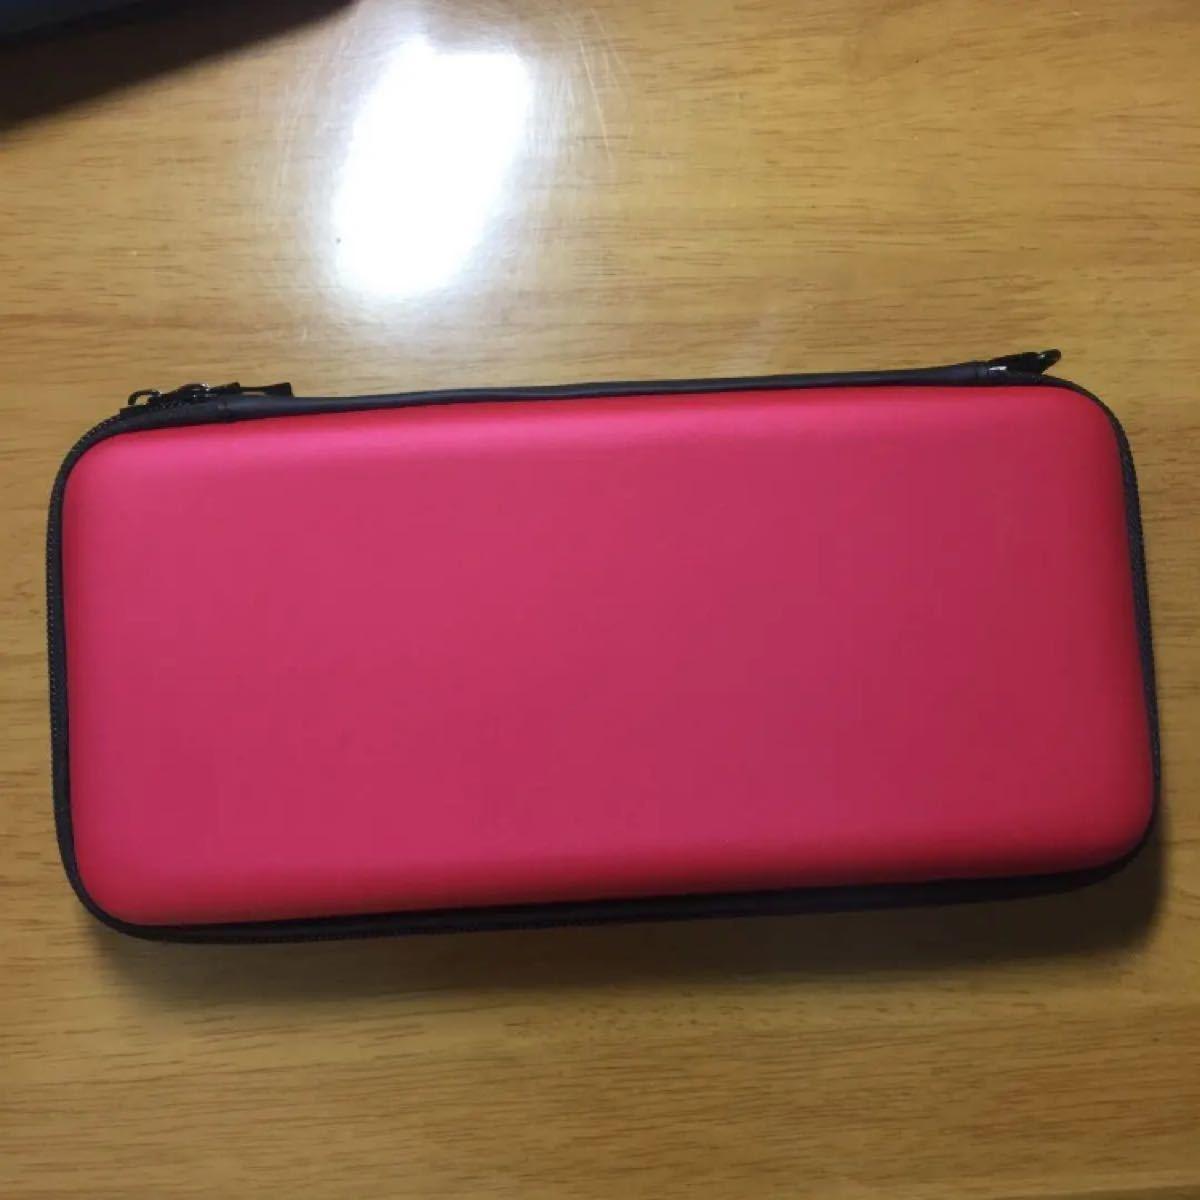 Nintendo Switch 任天堂スイッチケース 赤色